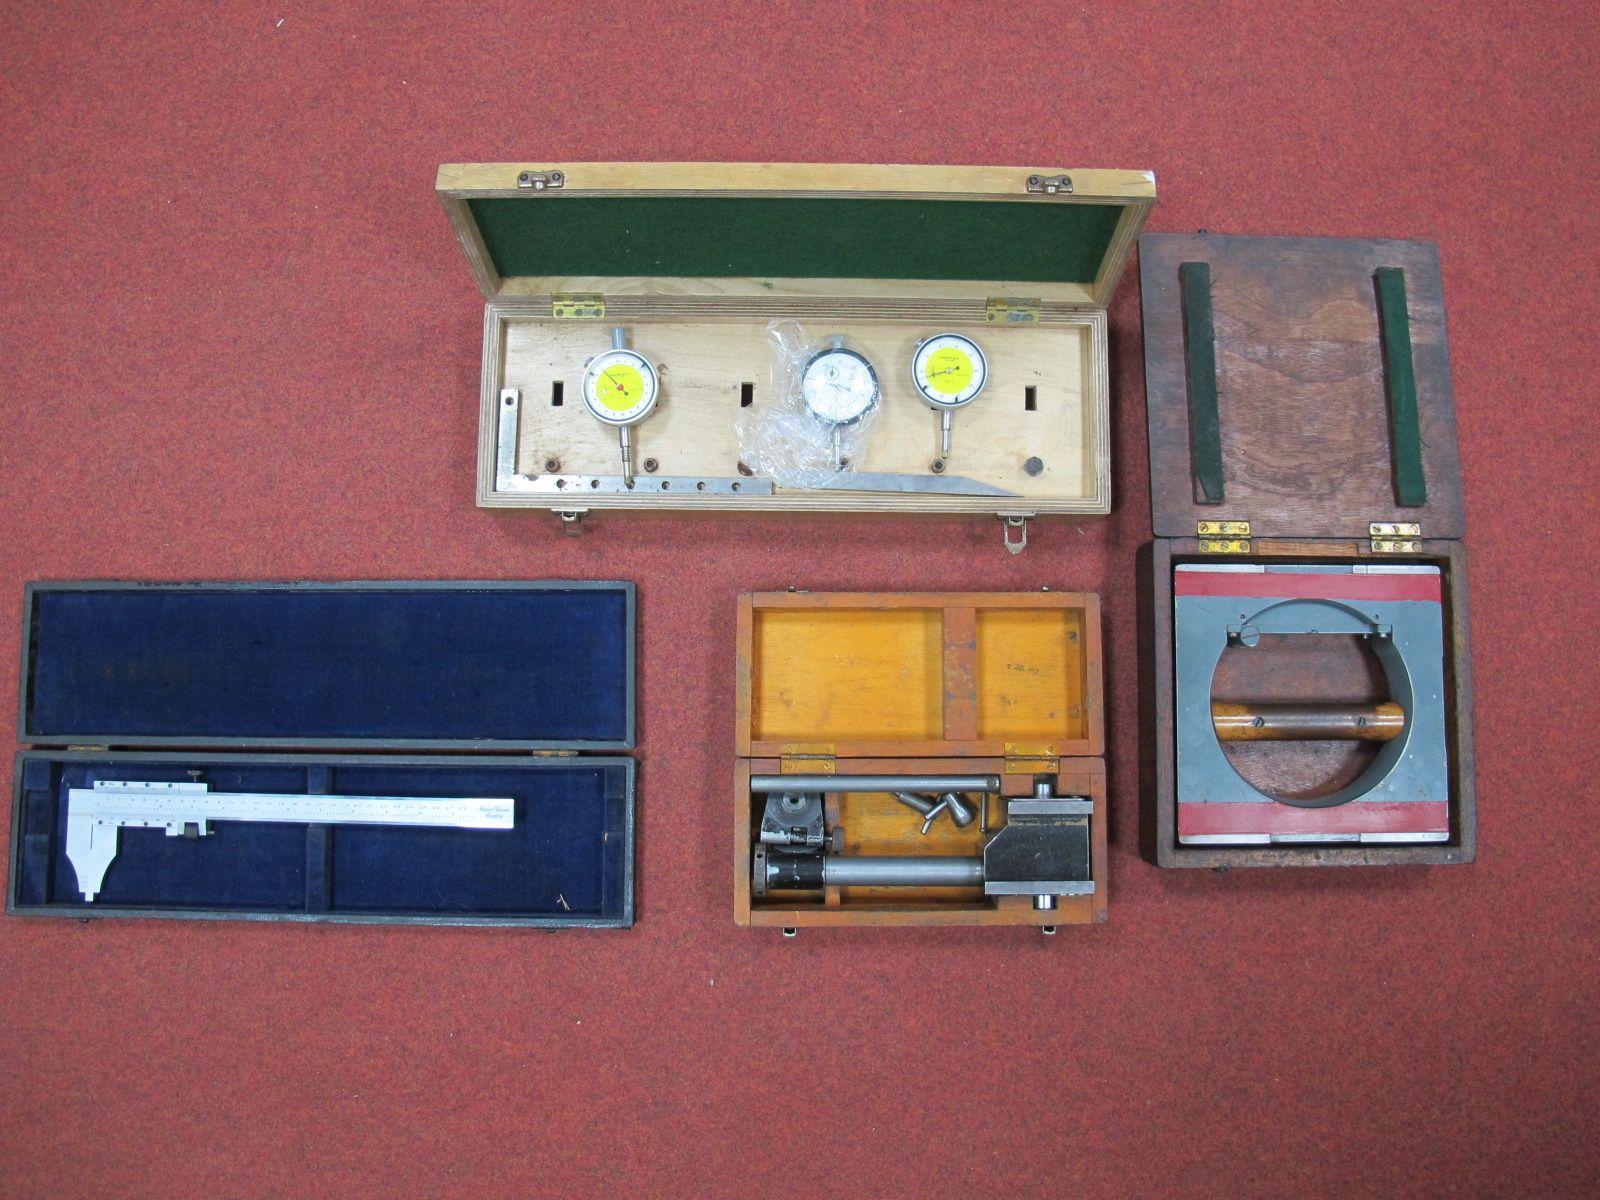 Lot 29 - Engineers Measuring Equipment, including a Benson 28cm (plus imperial) vernier, three dial